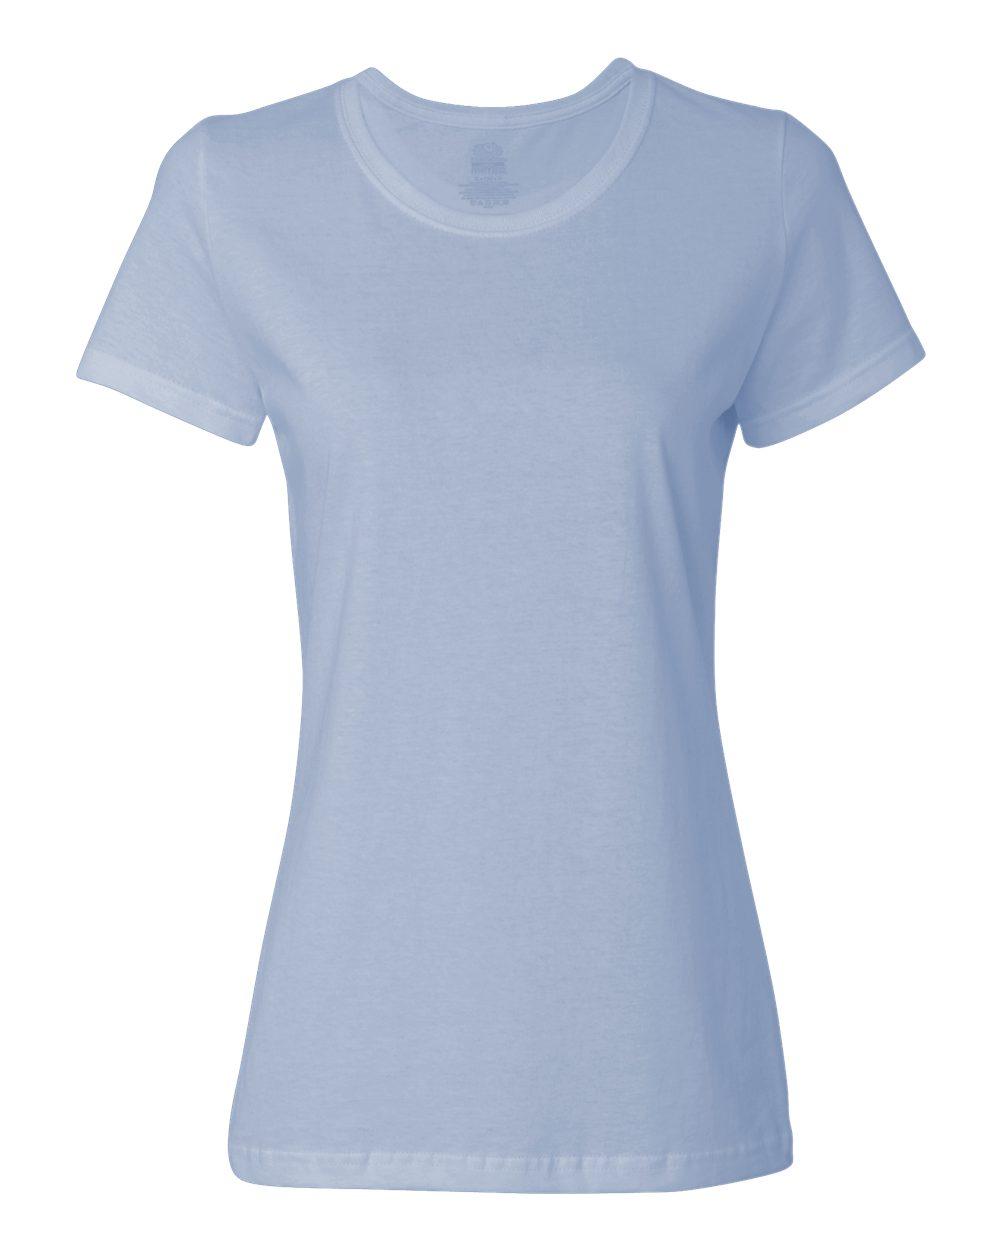 Screen Printing T Shirts Atlanta Rldm